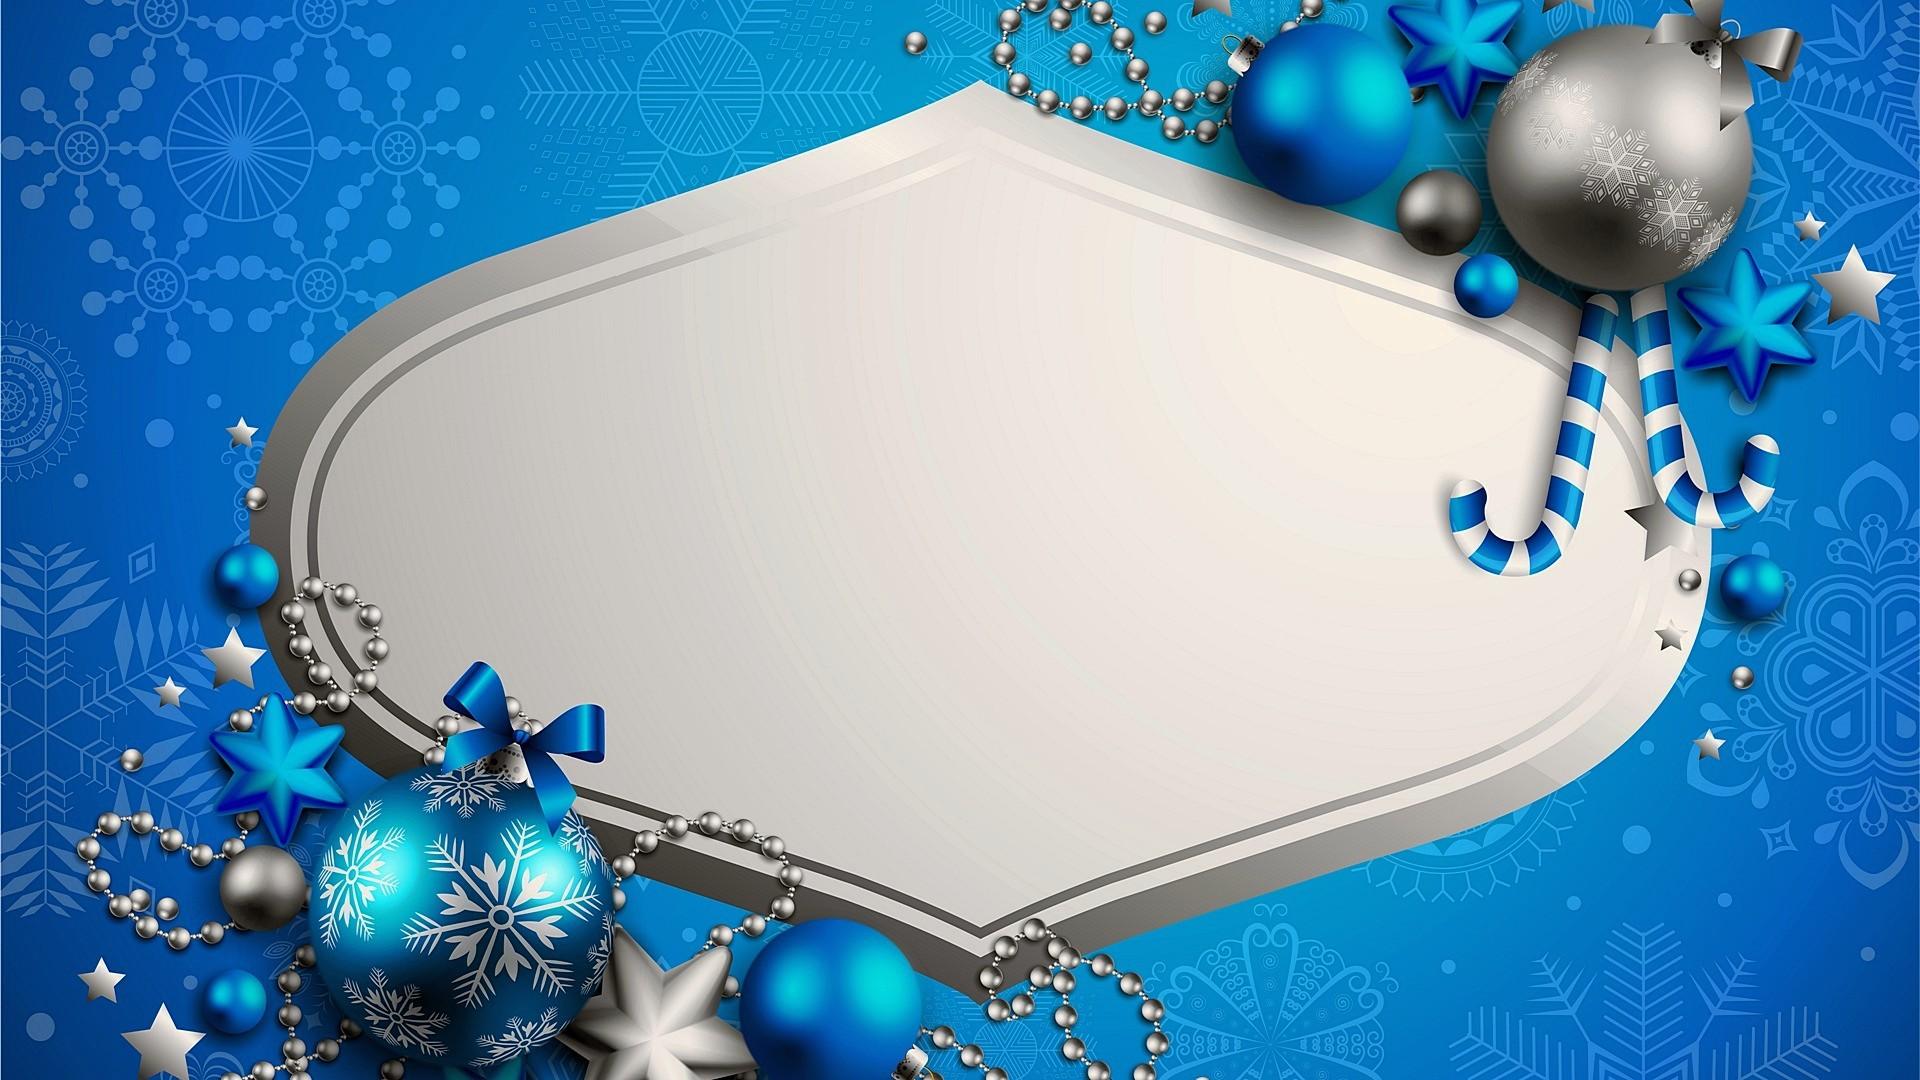 Animated Desktop Wallpaper Hd Blue Christmas Wallpaper 70 Images